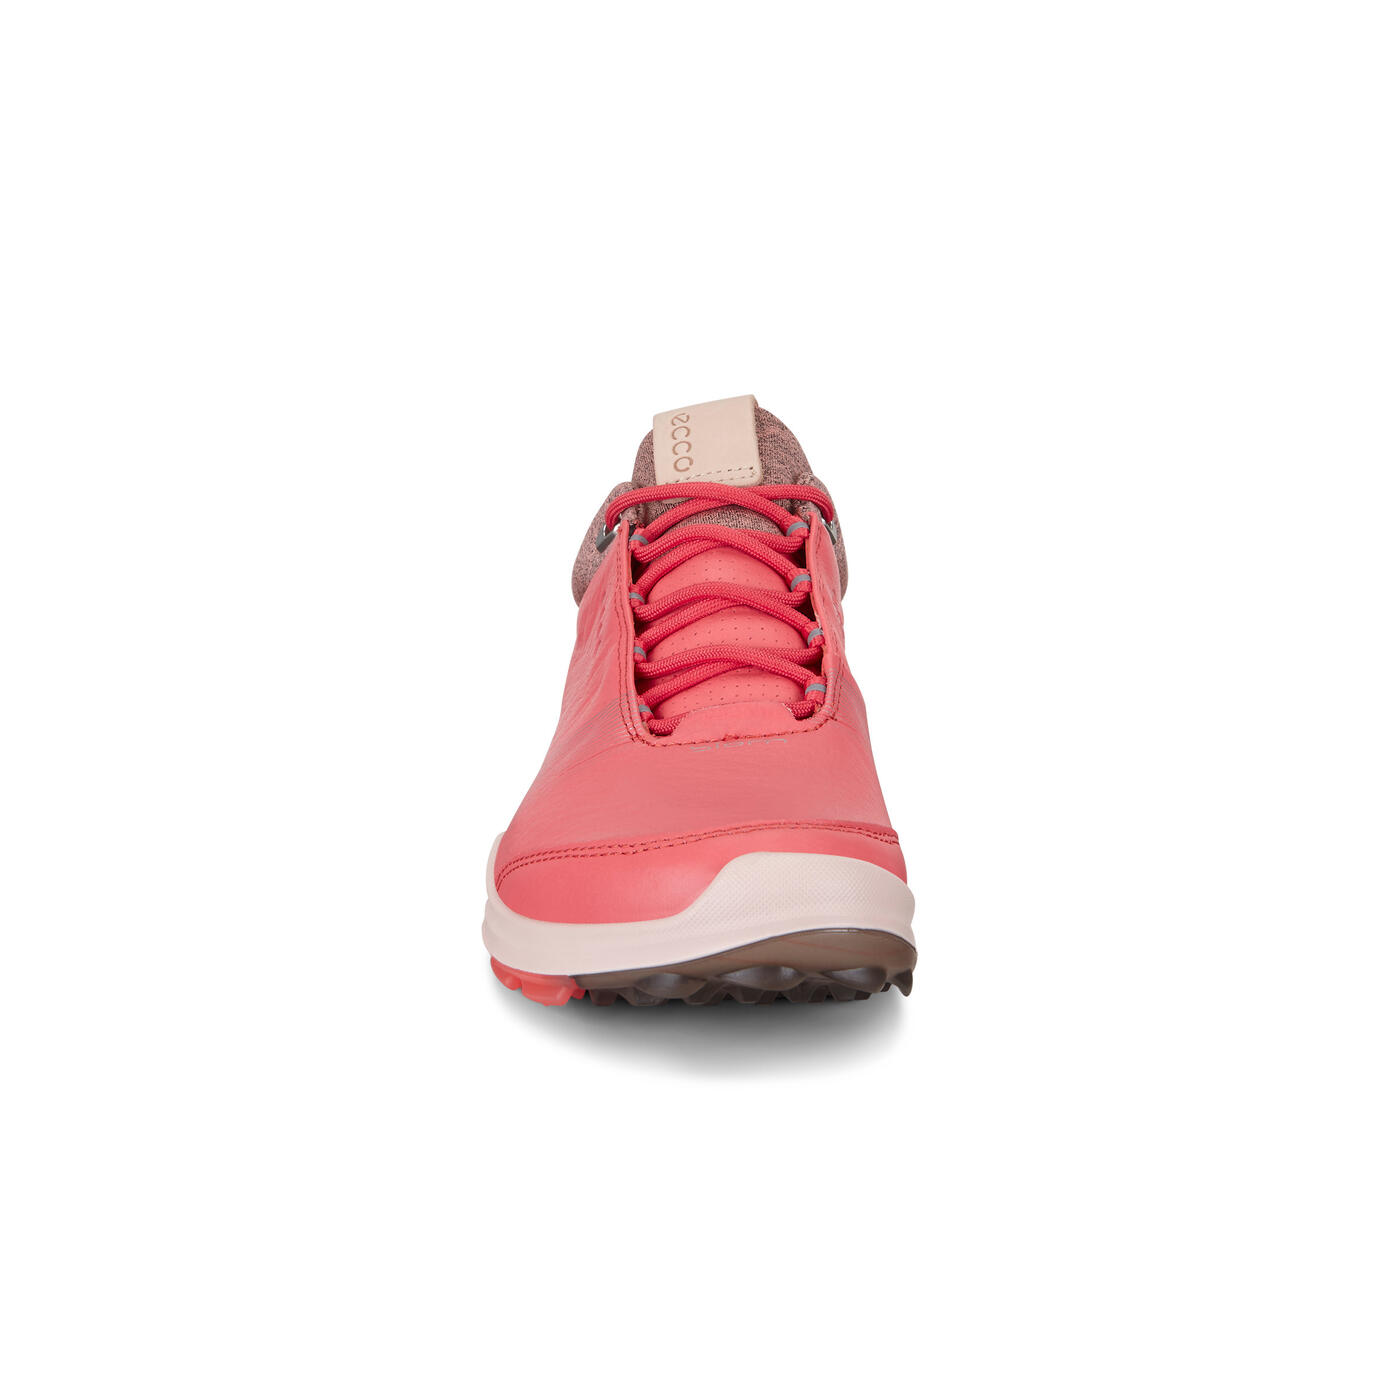 Chaussure ECCO Golf BIOM Hybrid 3 GTX pour femmes